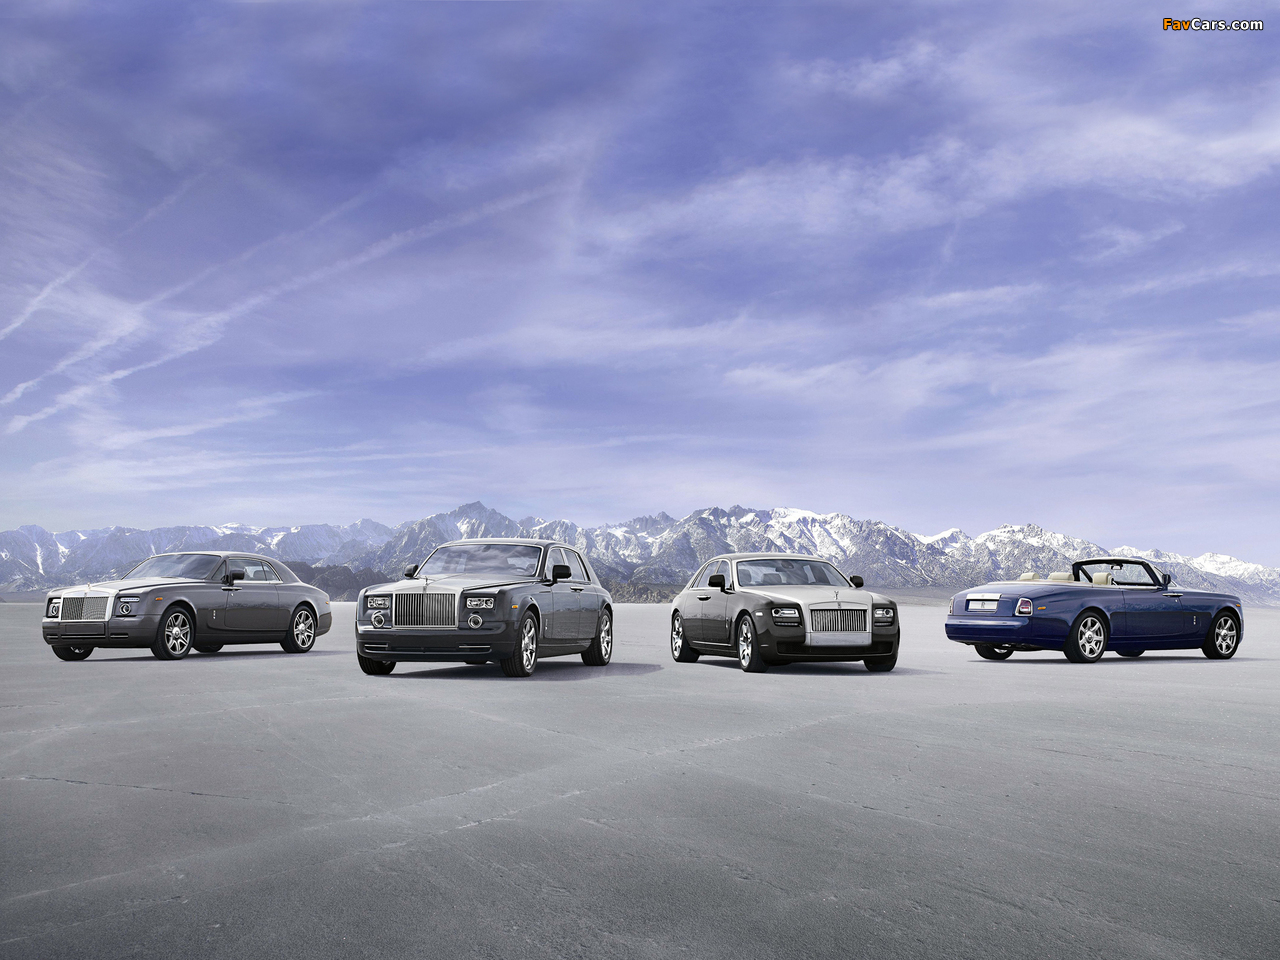 Images of Rolls-Royce (1280 x 960)